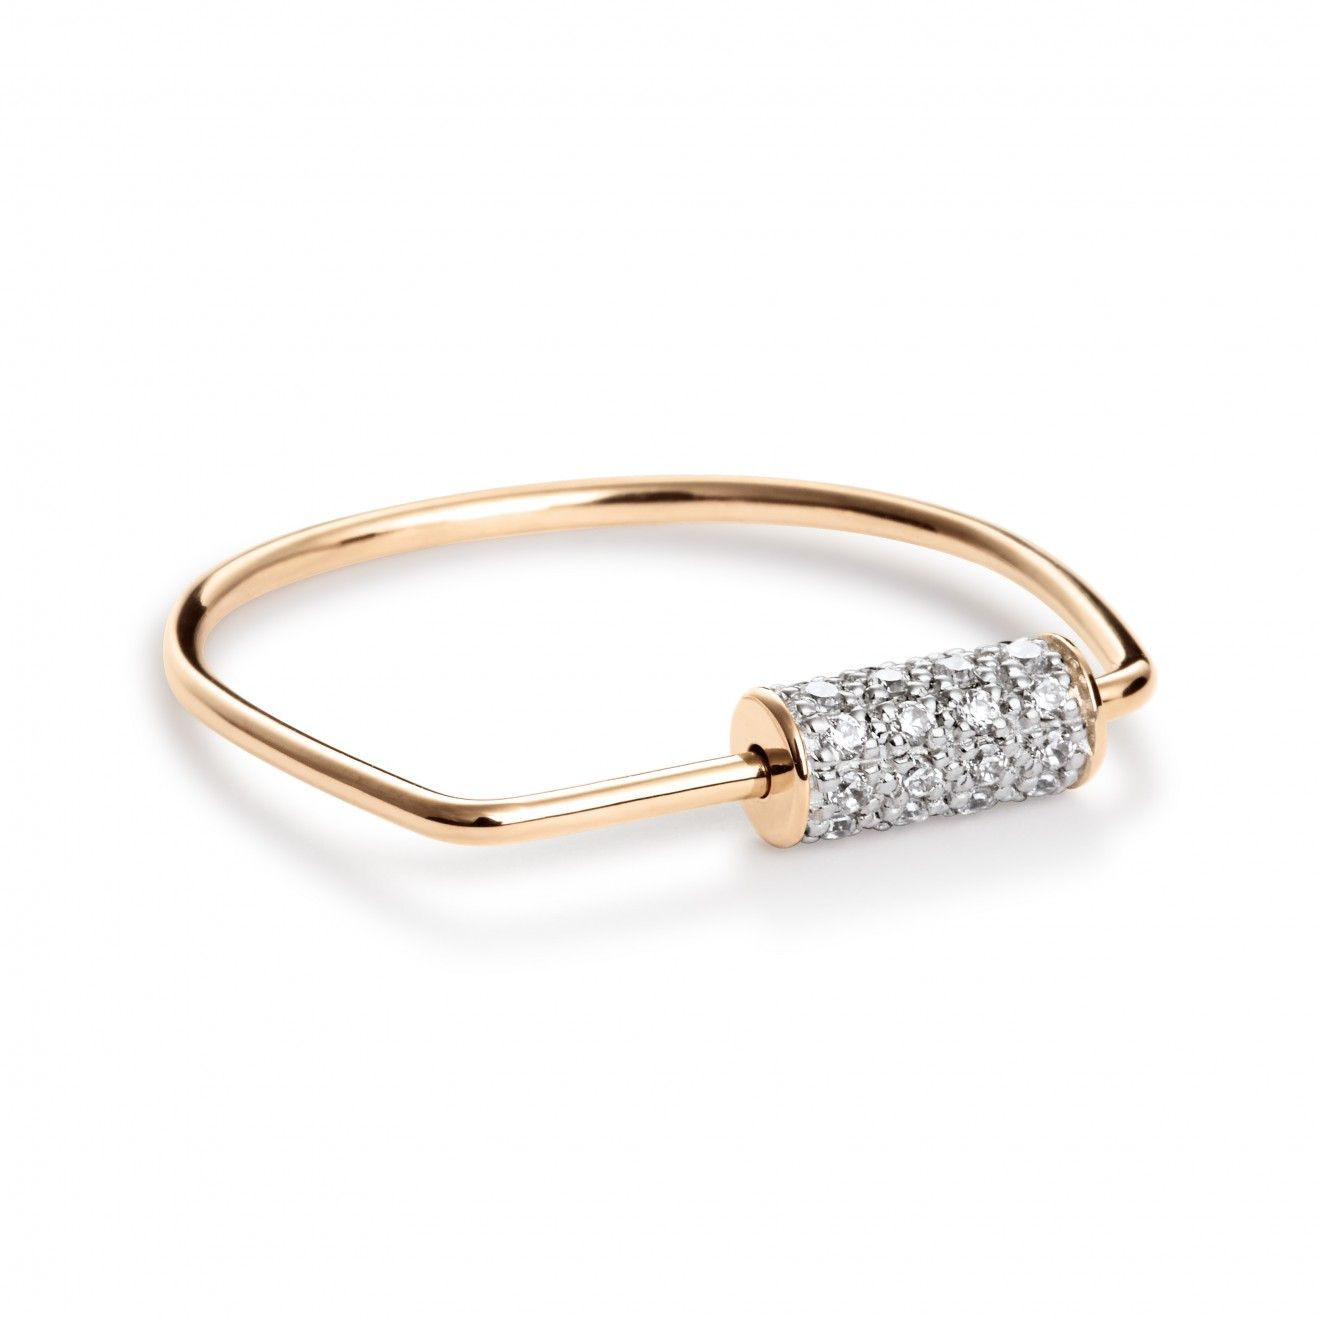 Mini Paja De Diamantes De 18 Quilates Se Elevó Ginette Collar De Oro Ny IgJUTyjRa